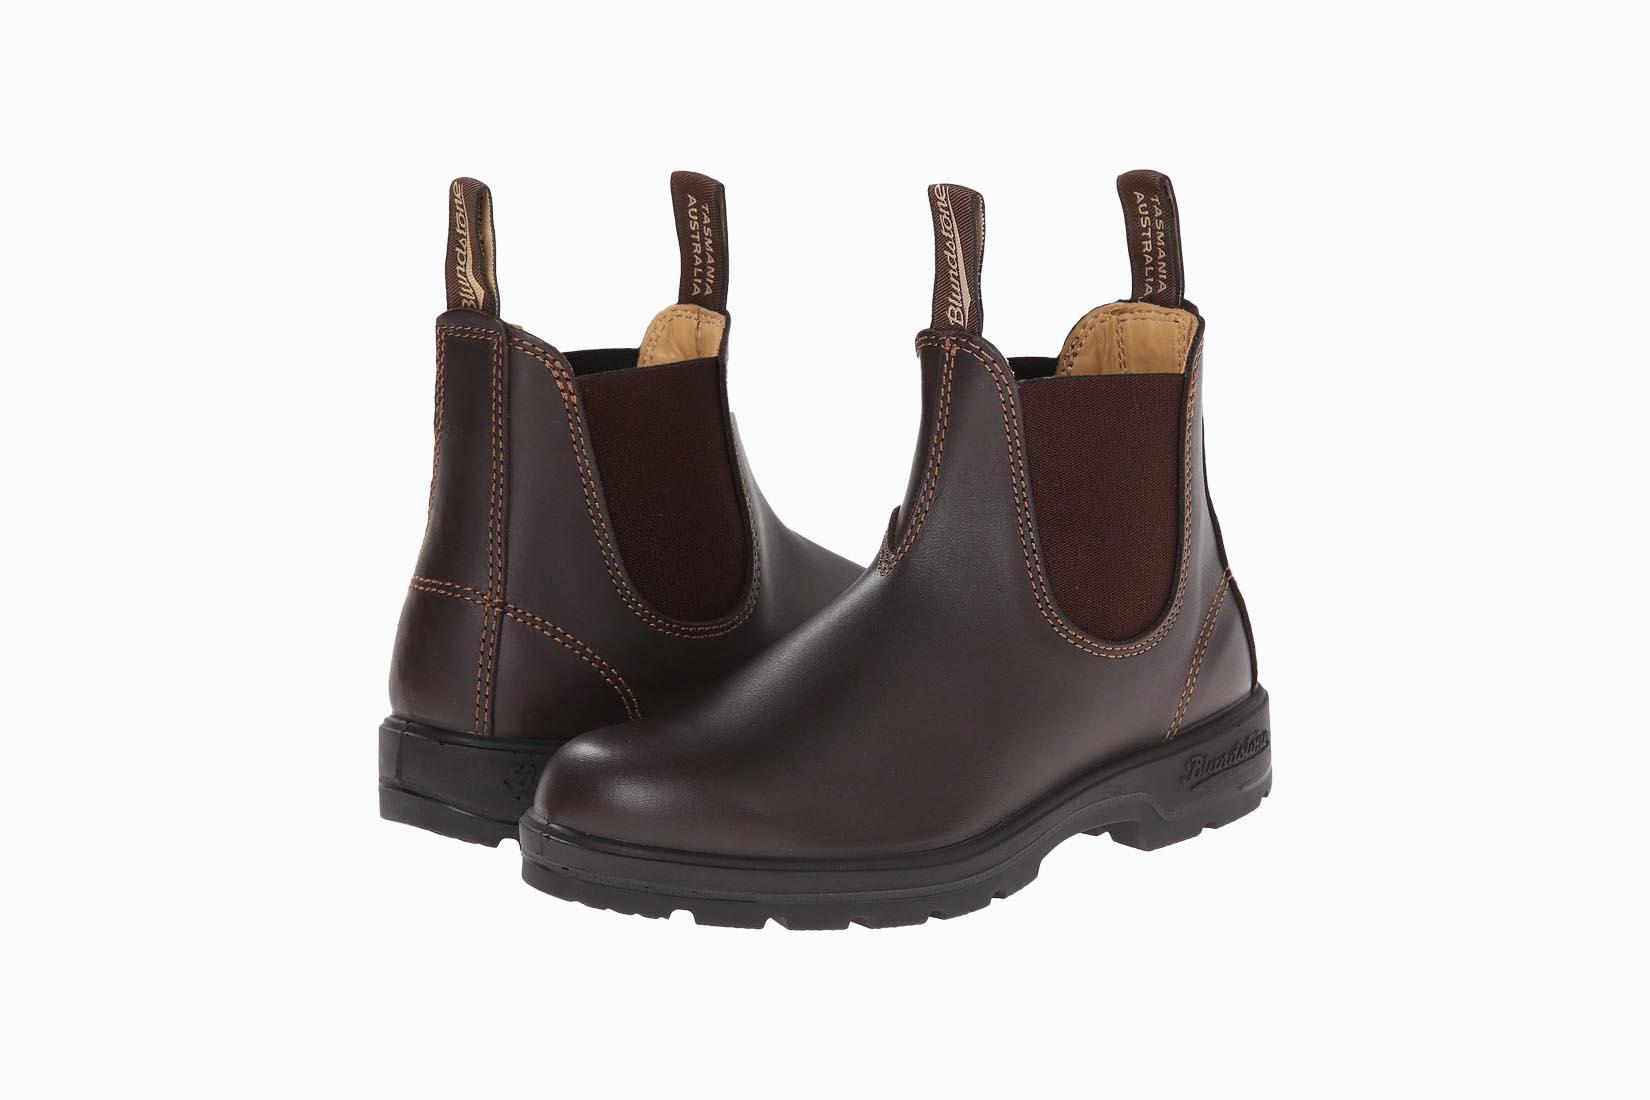 best boots men blundstone 550 boot review Luxe Digital